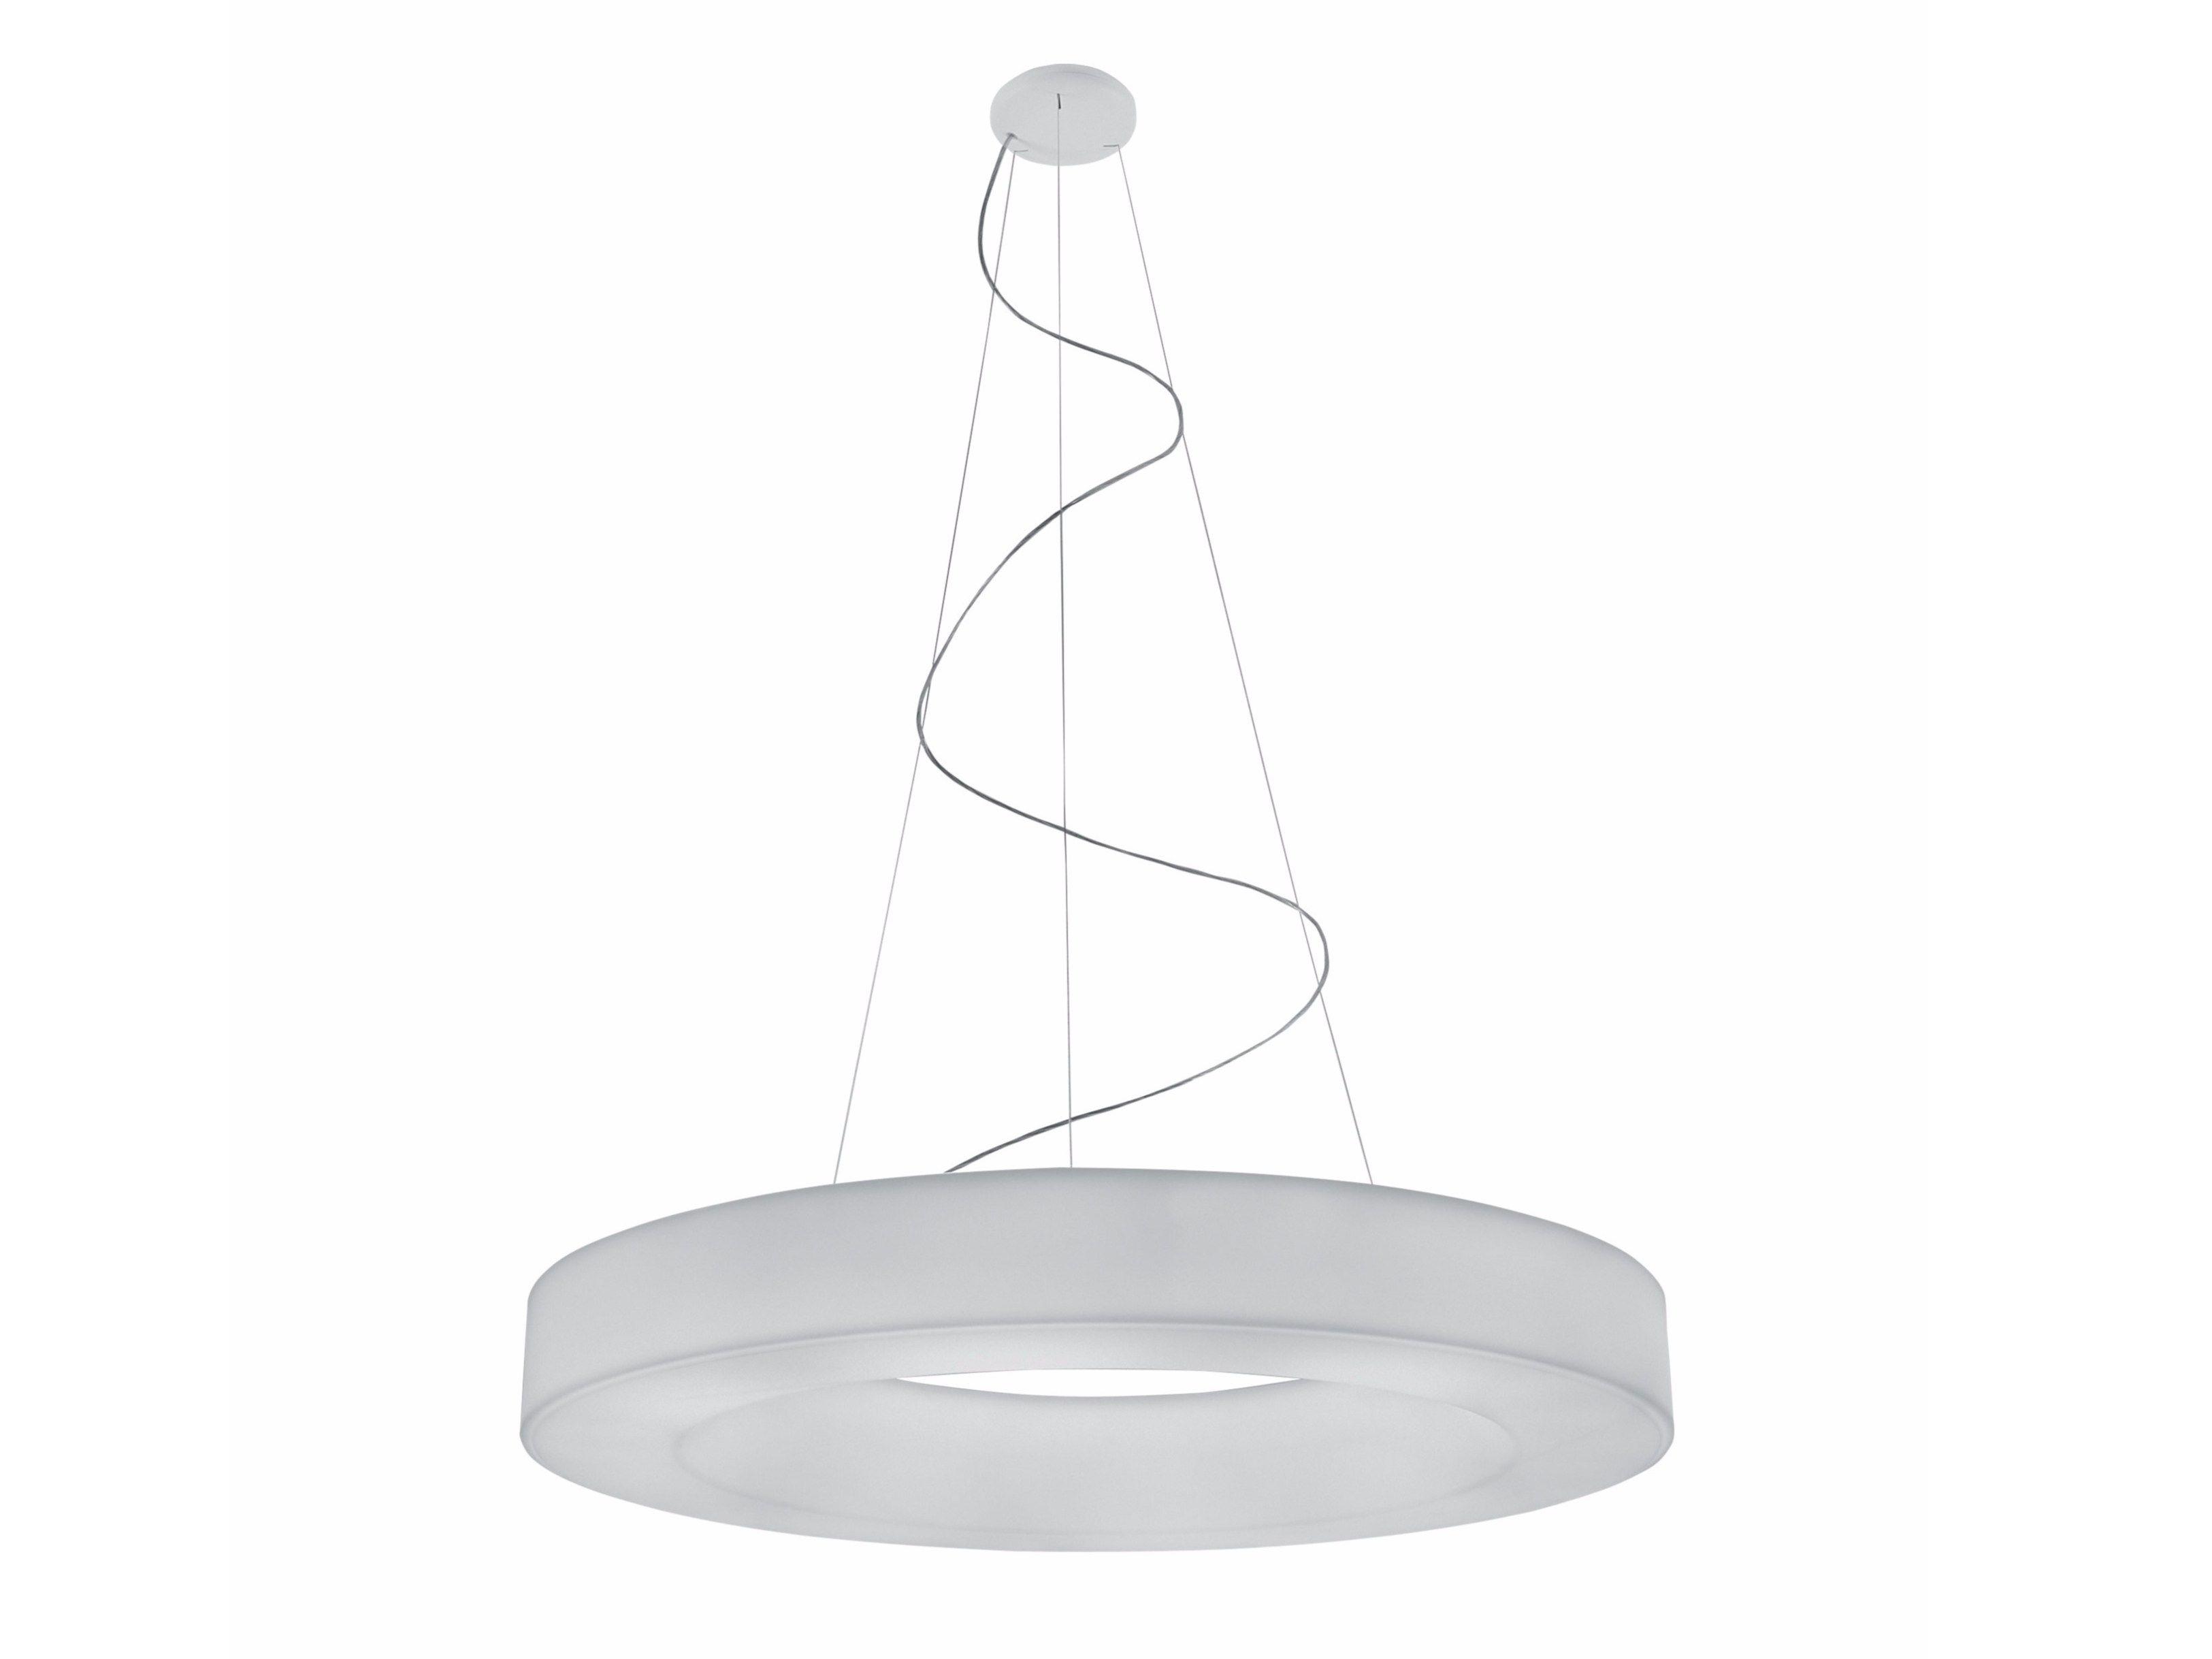 Polyurethane pendant lamp CAMPANA By Lucente design Paolo Mapelli